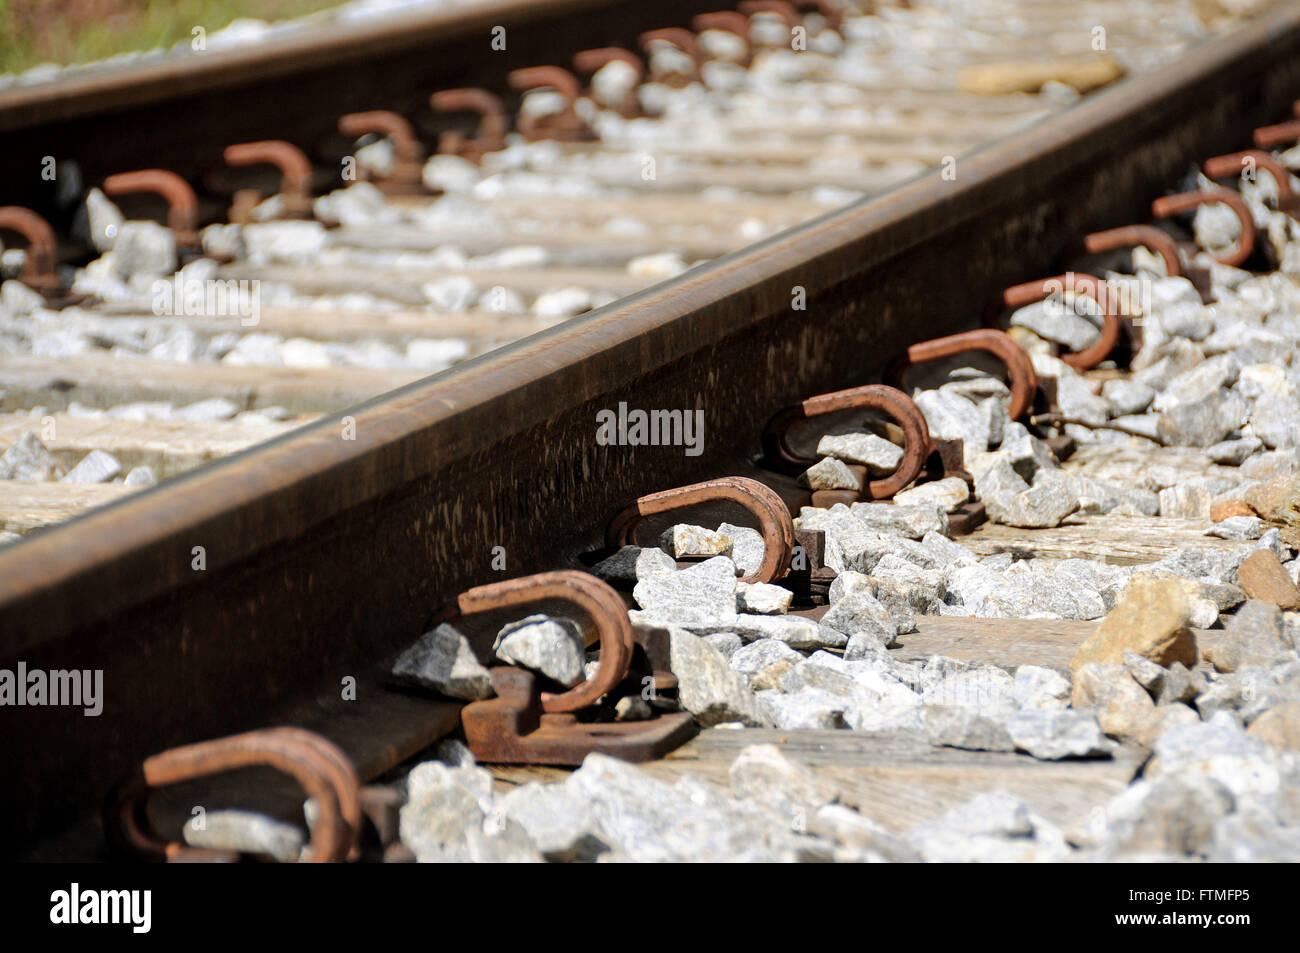 Railway tracks of Ouro Preto - trains Vale SA former CVRD - Stock Image